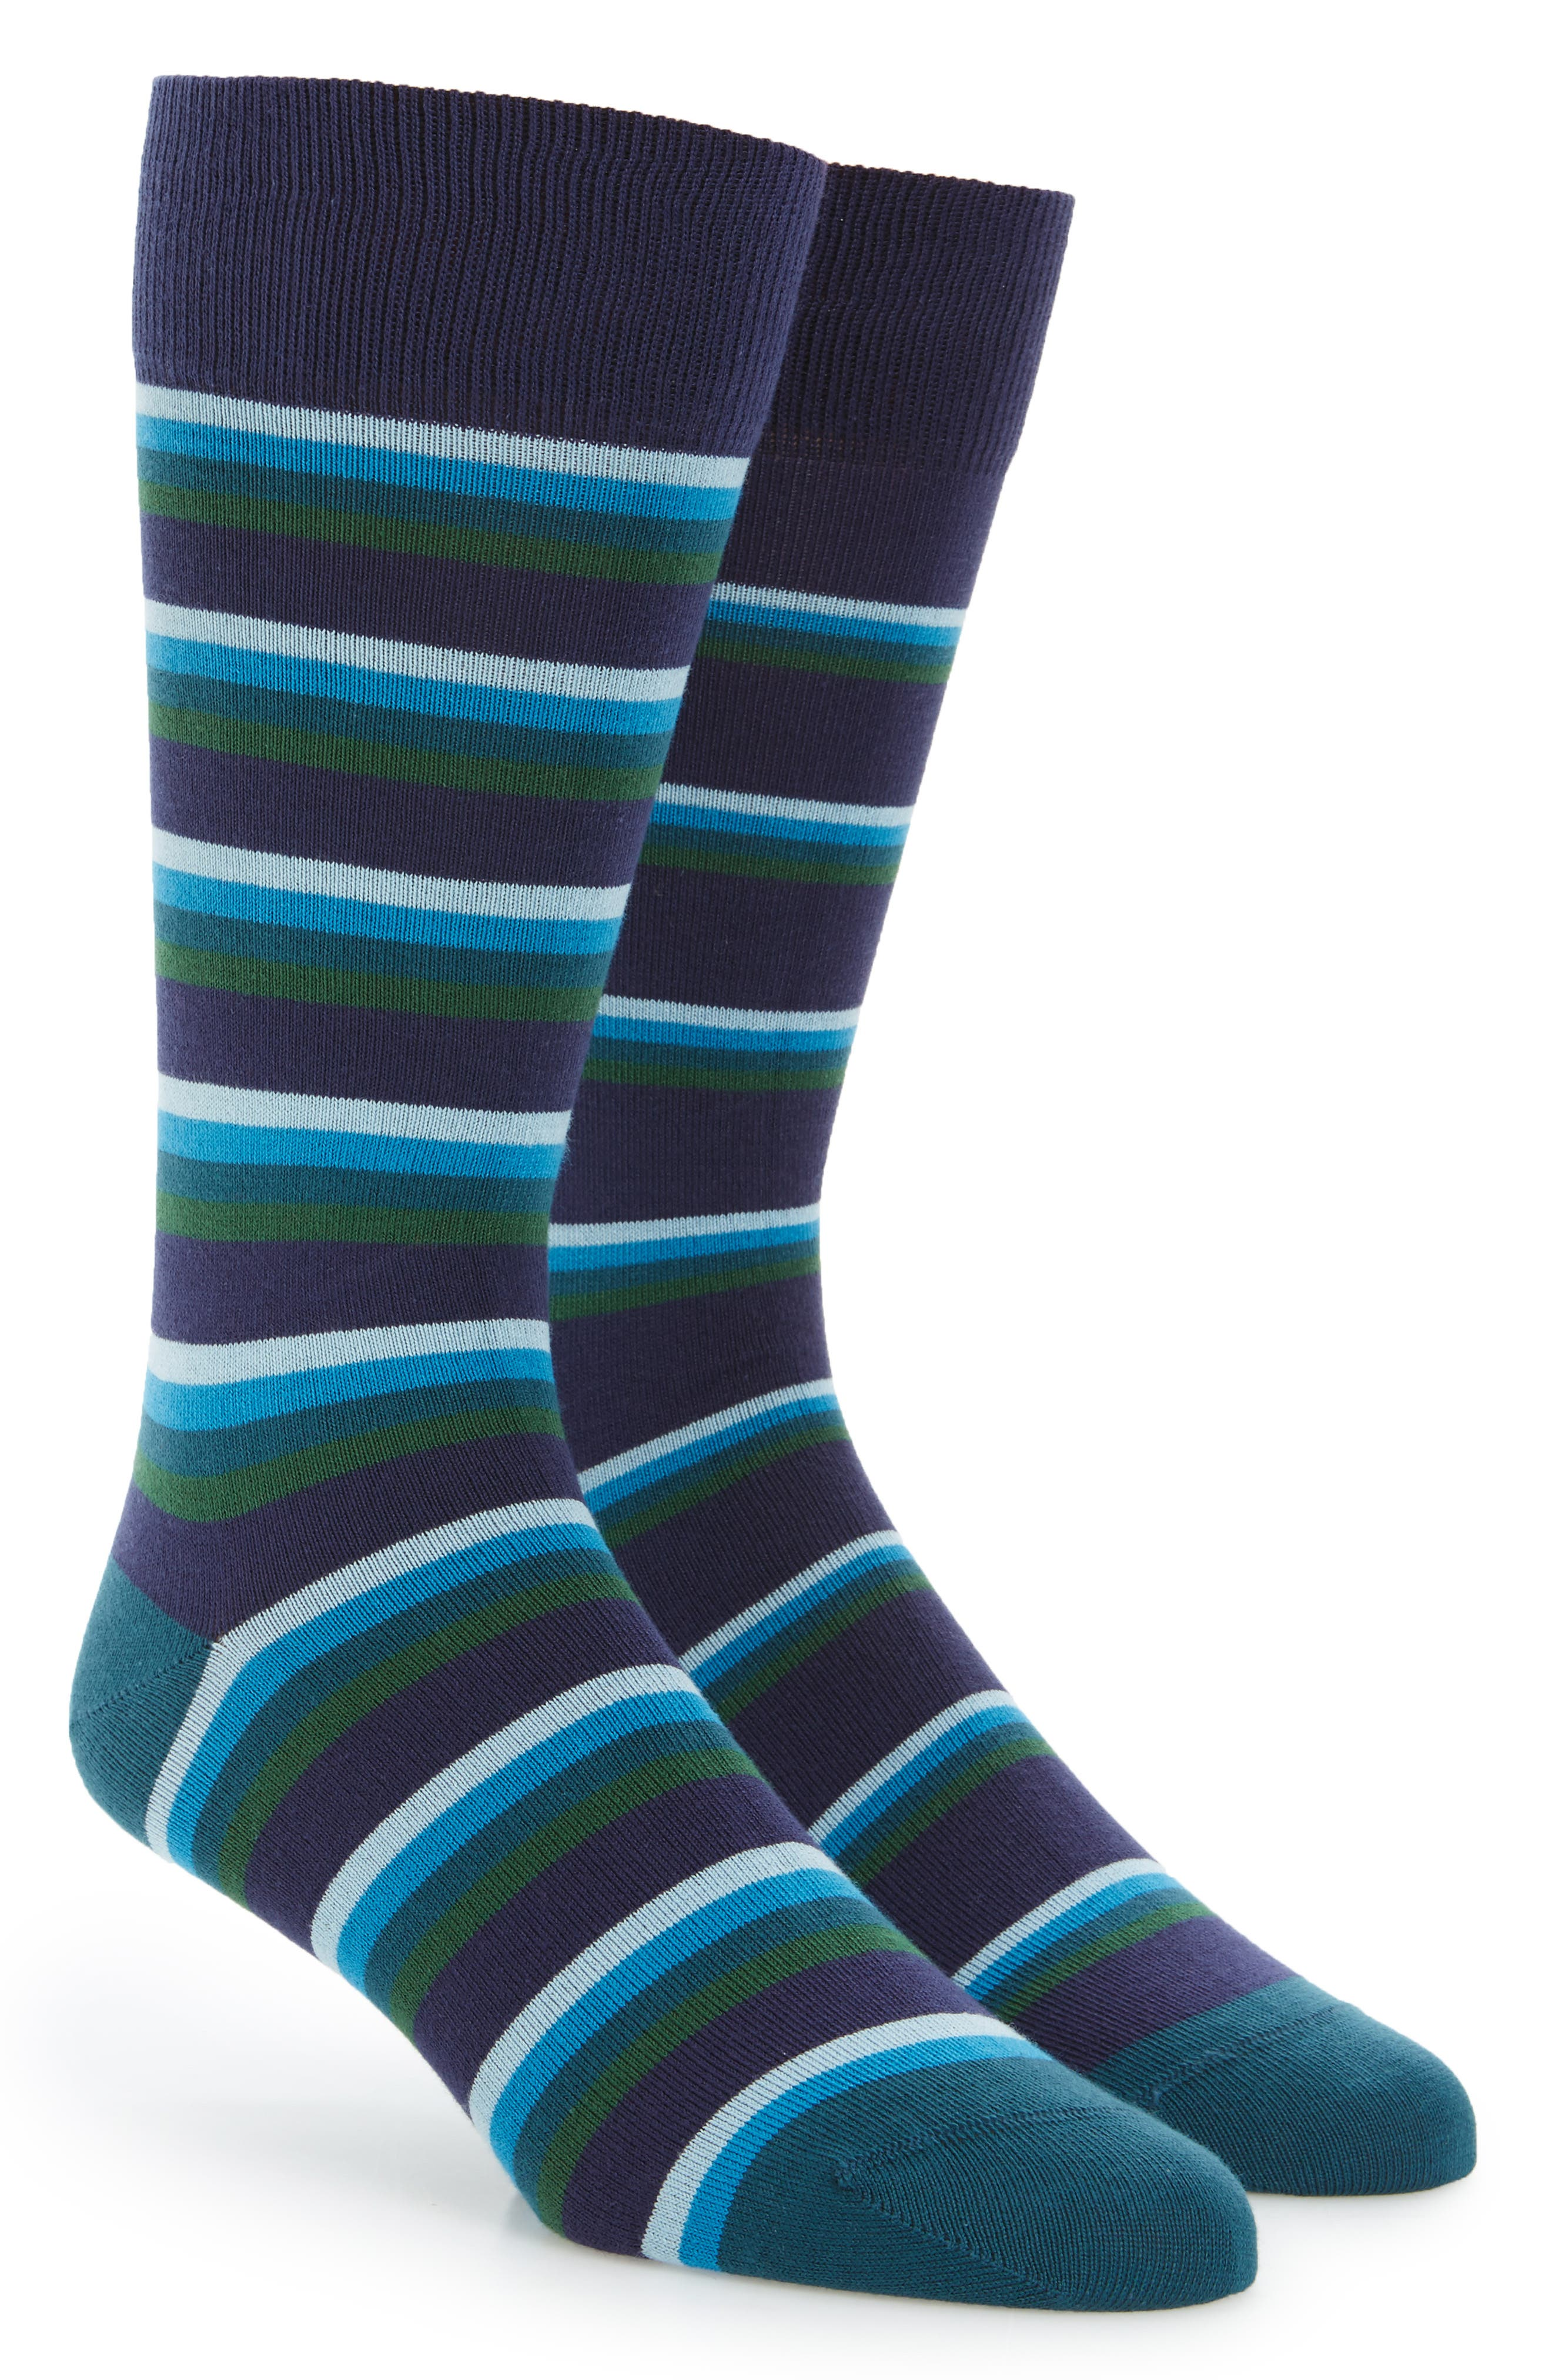 Stripe Socks,                             Main thumbnail 1, color,                             Blue/ Green